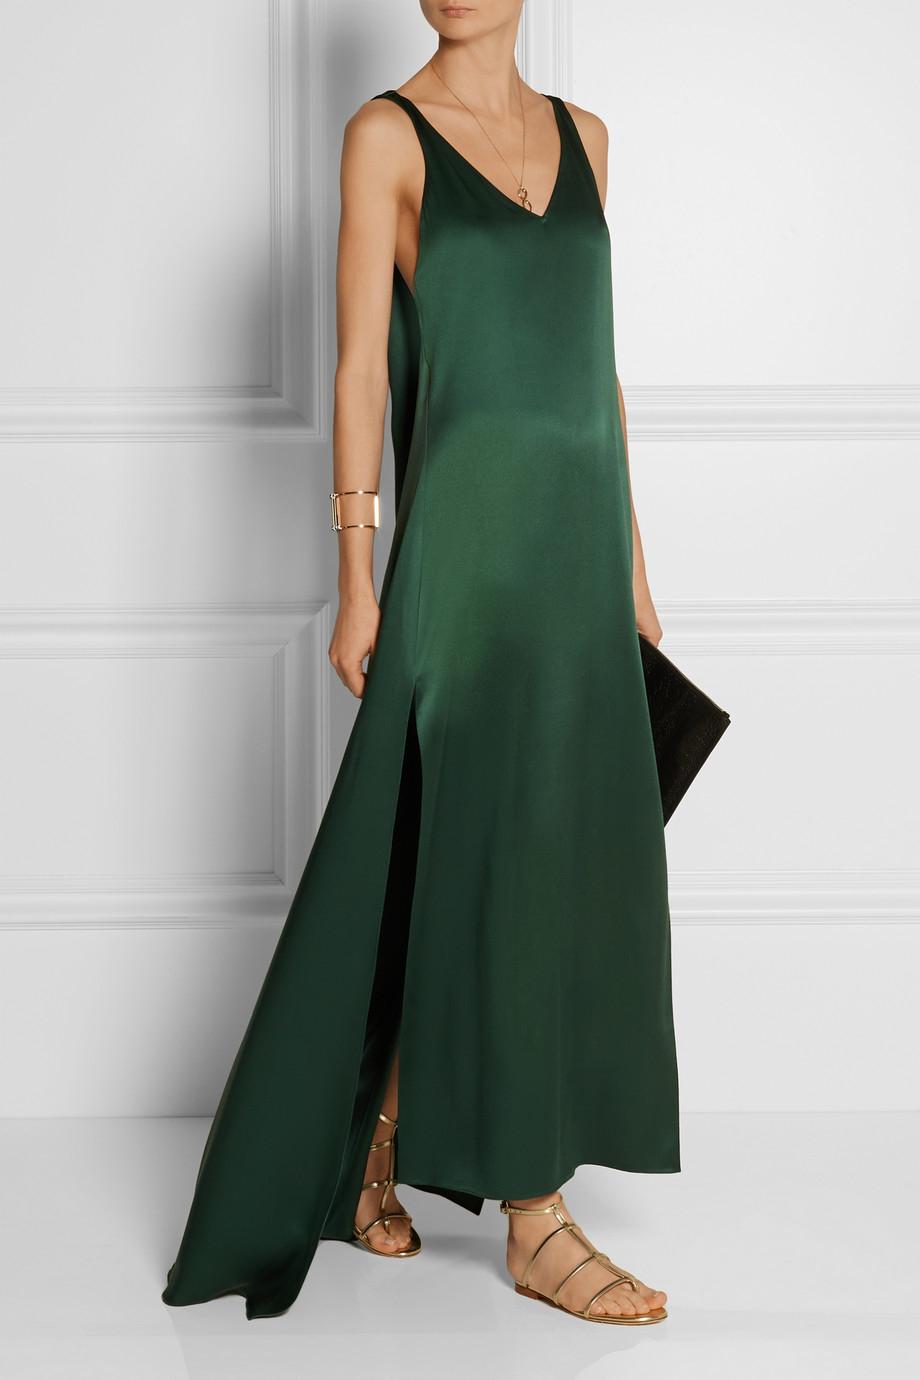 Lyst Rosetta Getty Silk Dress In Green